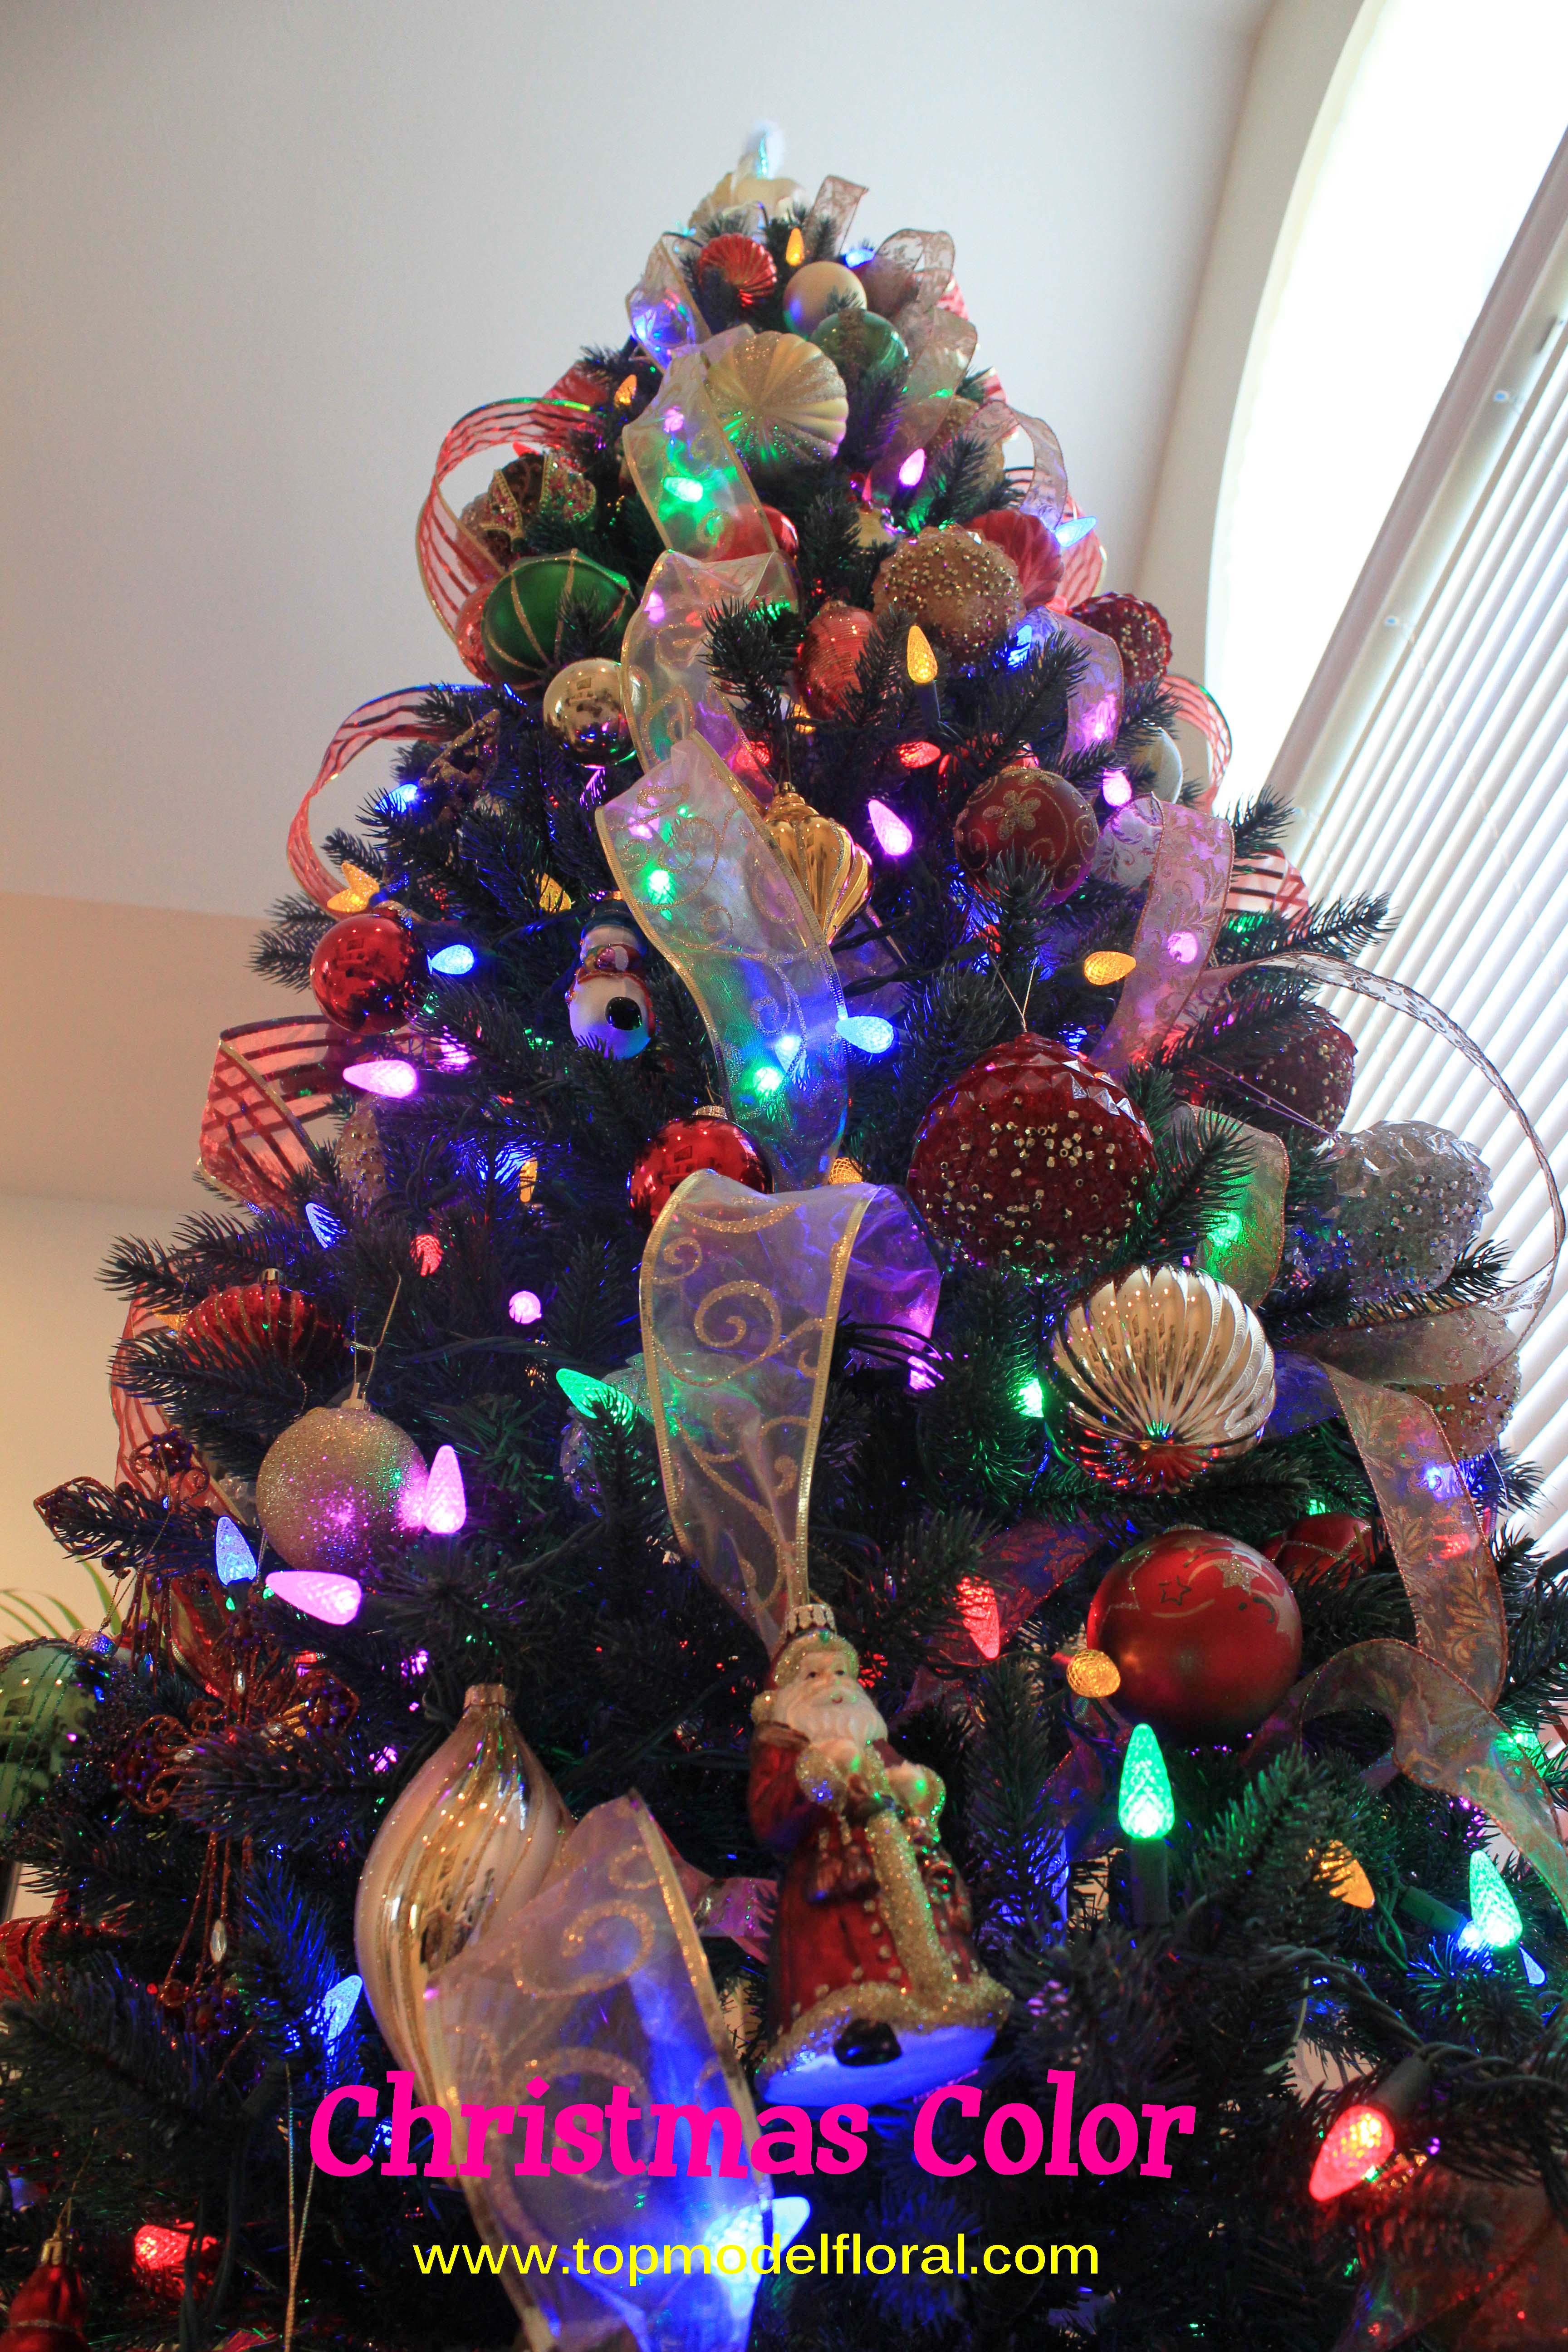 10 Elegant Christmas Tree Decorating Ideas With Multi Colored Lights multi colored light christmas tree ideas my web value 2021